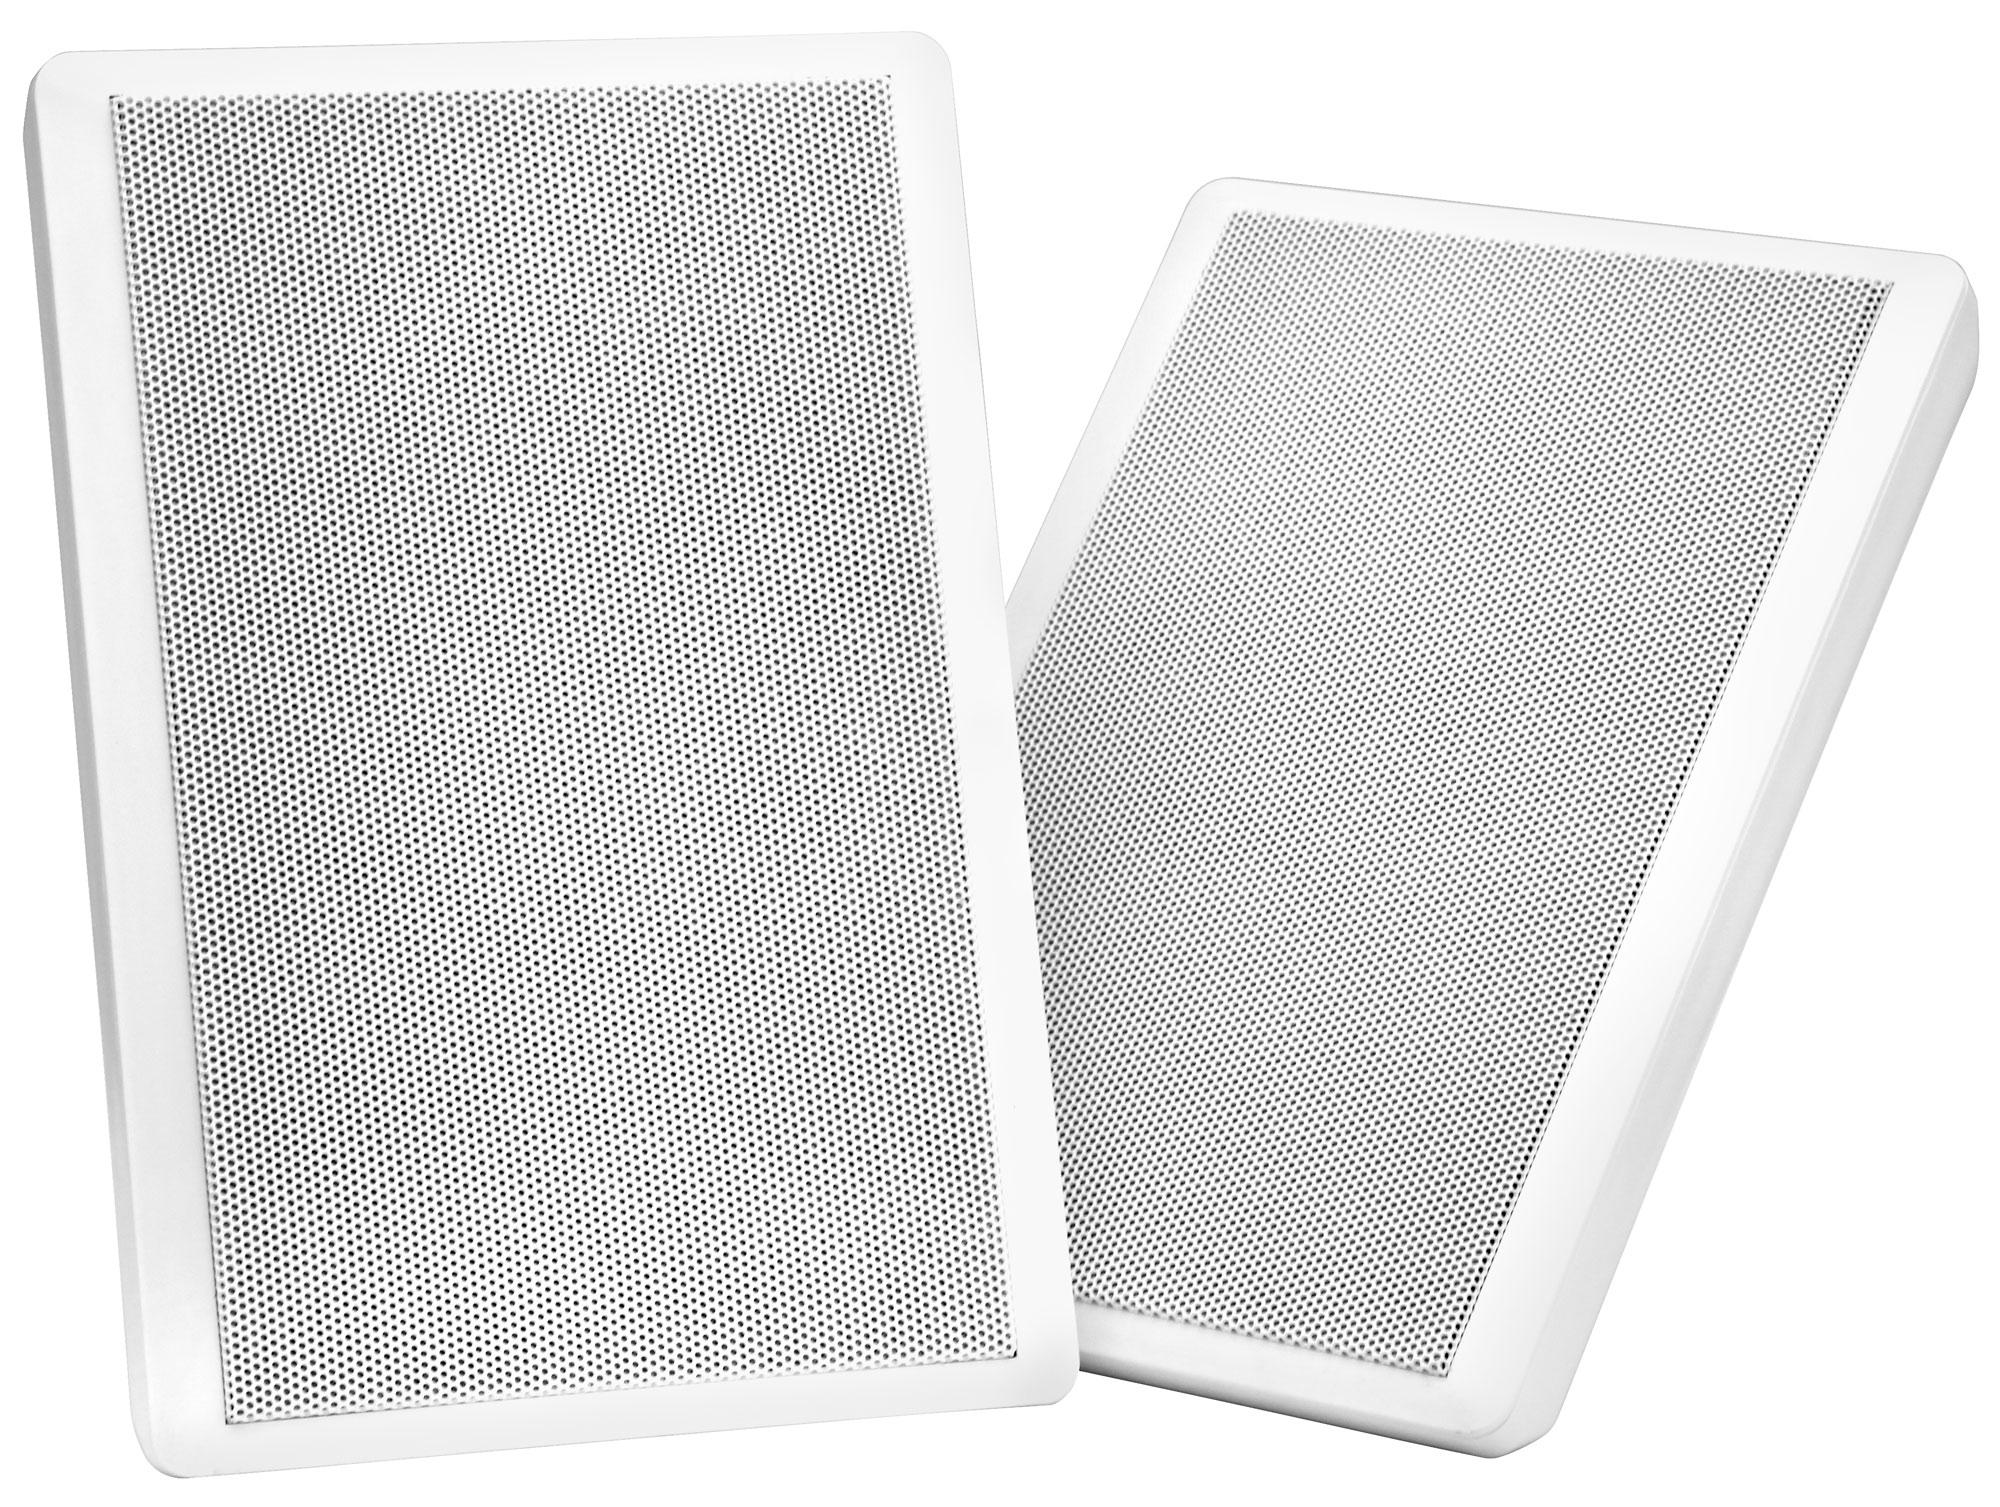 Pronomic Fls 540 Wh Pair Of Flat Panel Wall Speakers